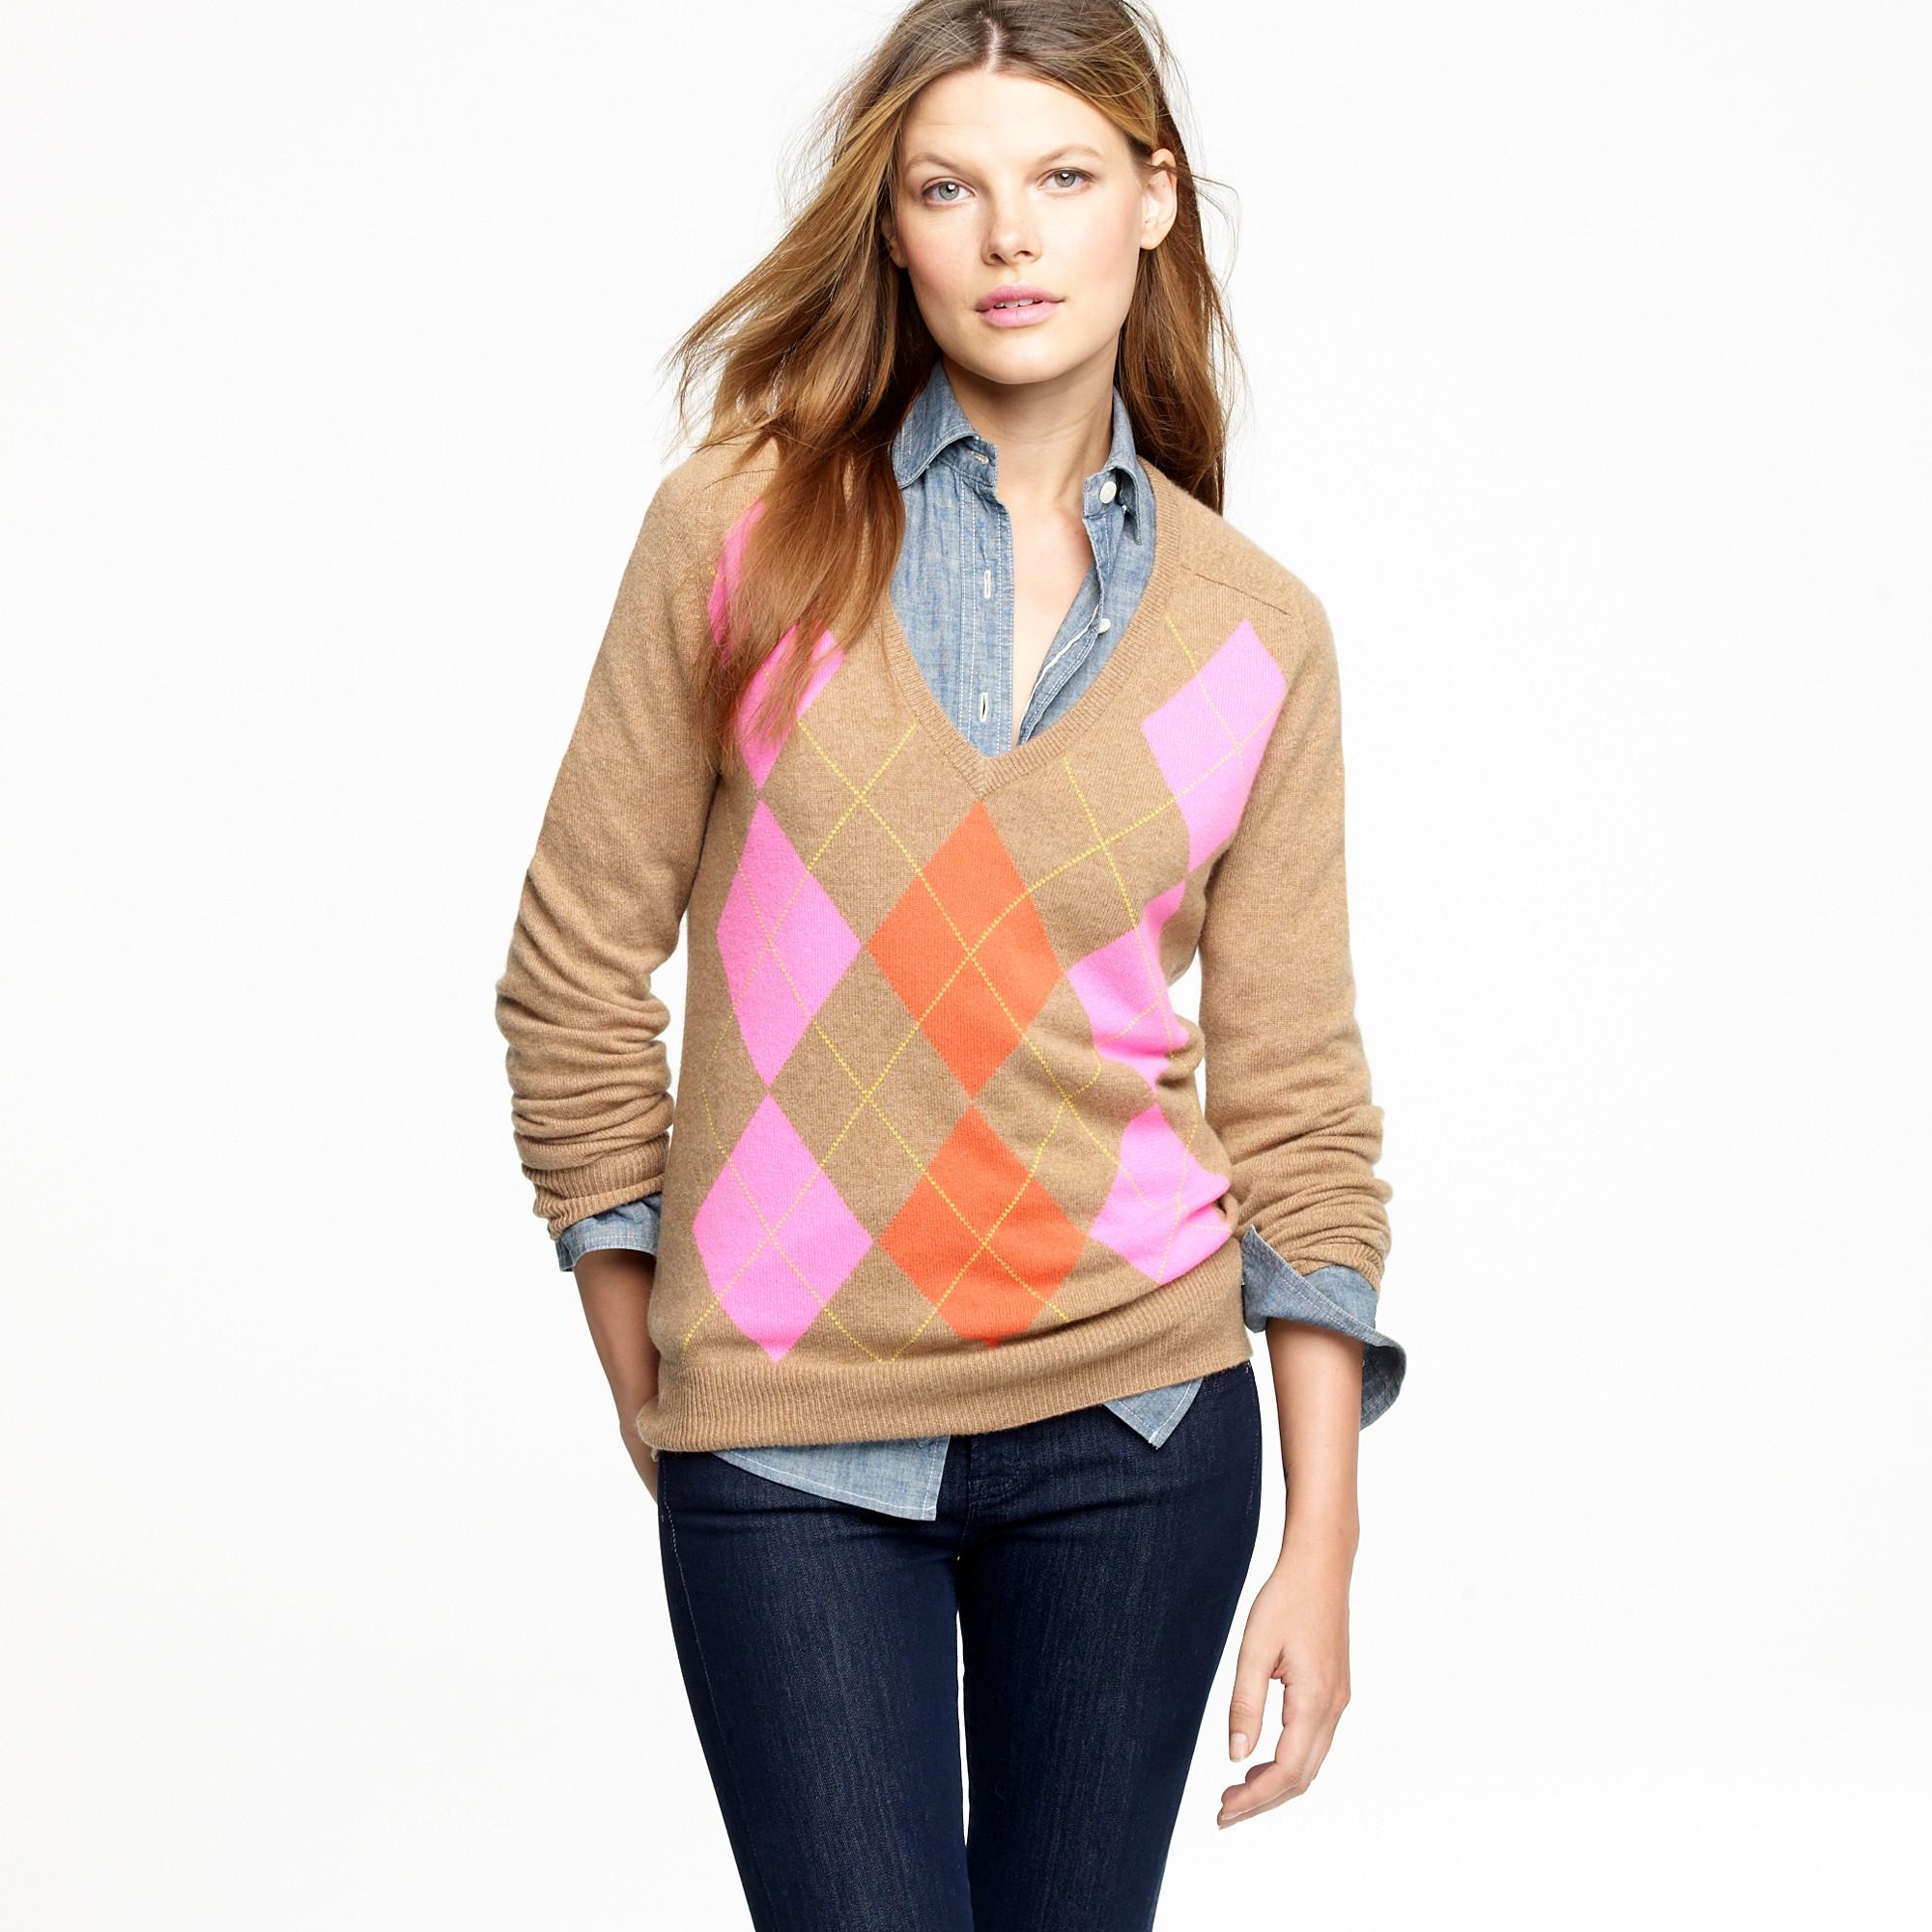 J.crew Cashmere Clash Argyle Sweater in Natural | Lyst